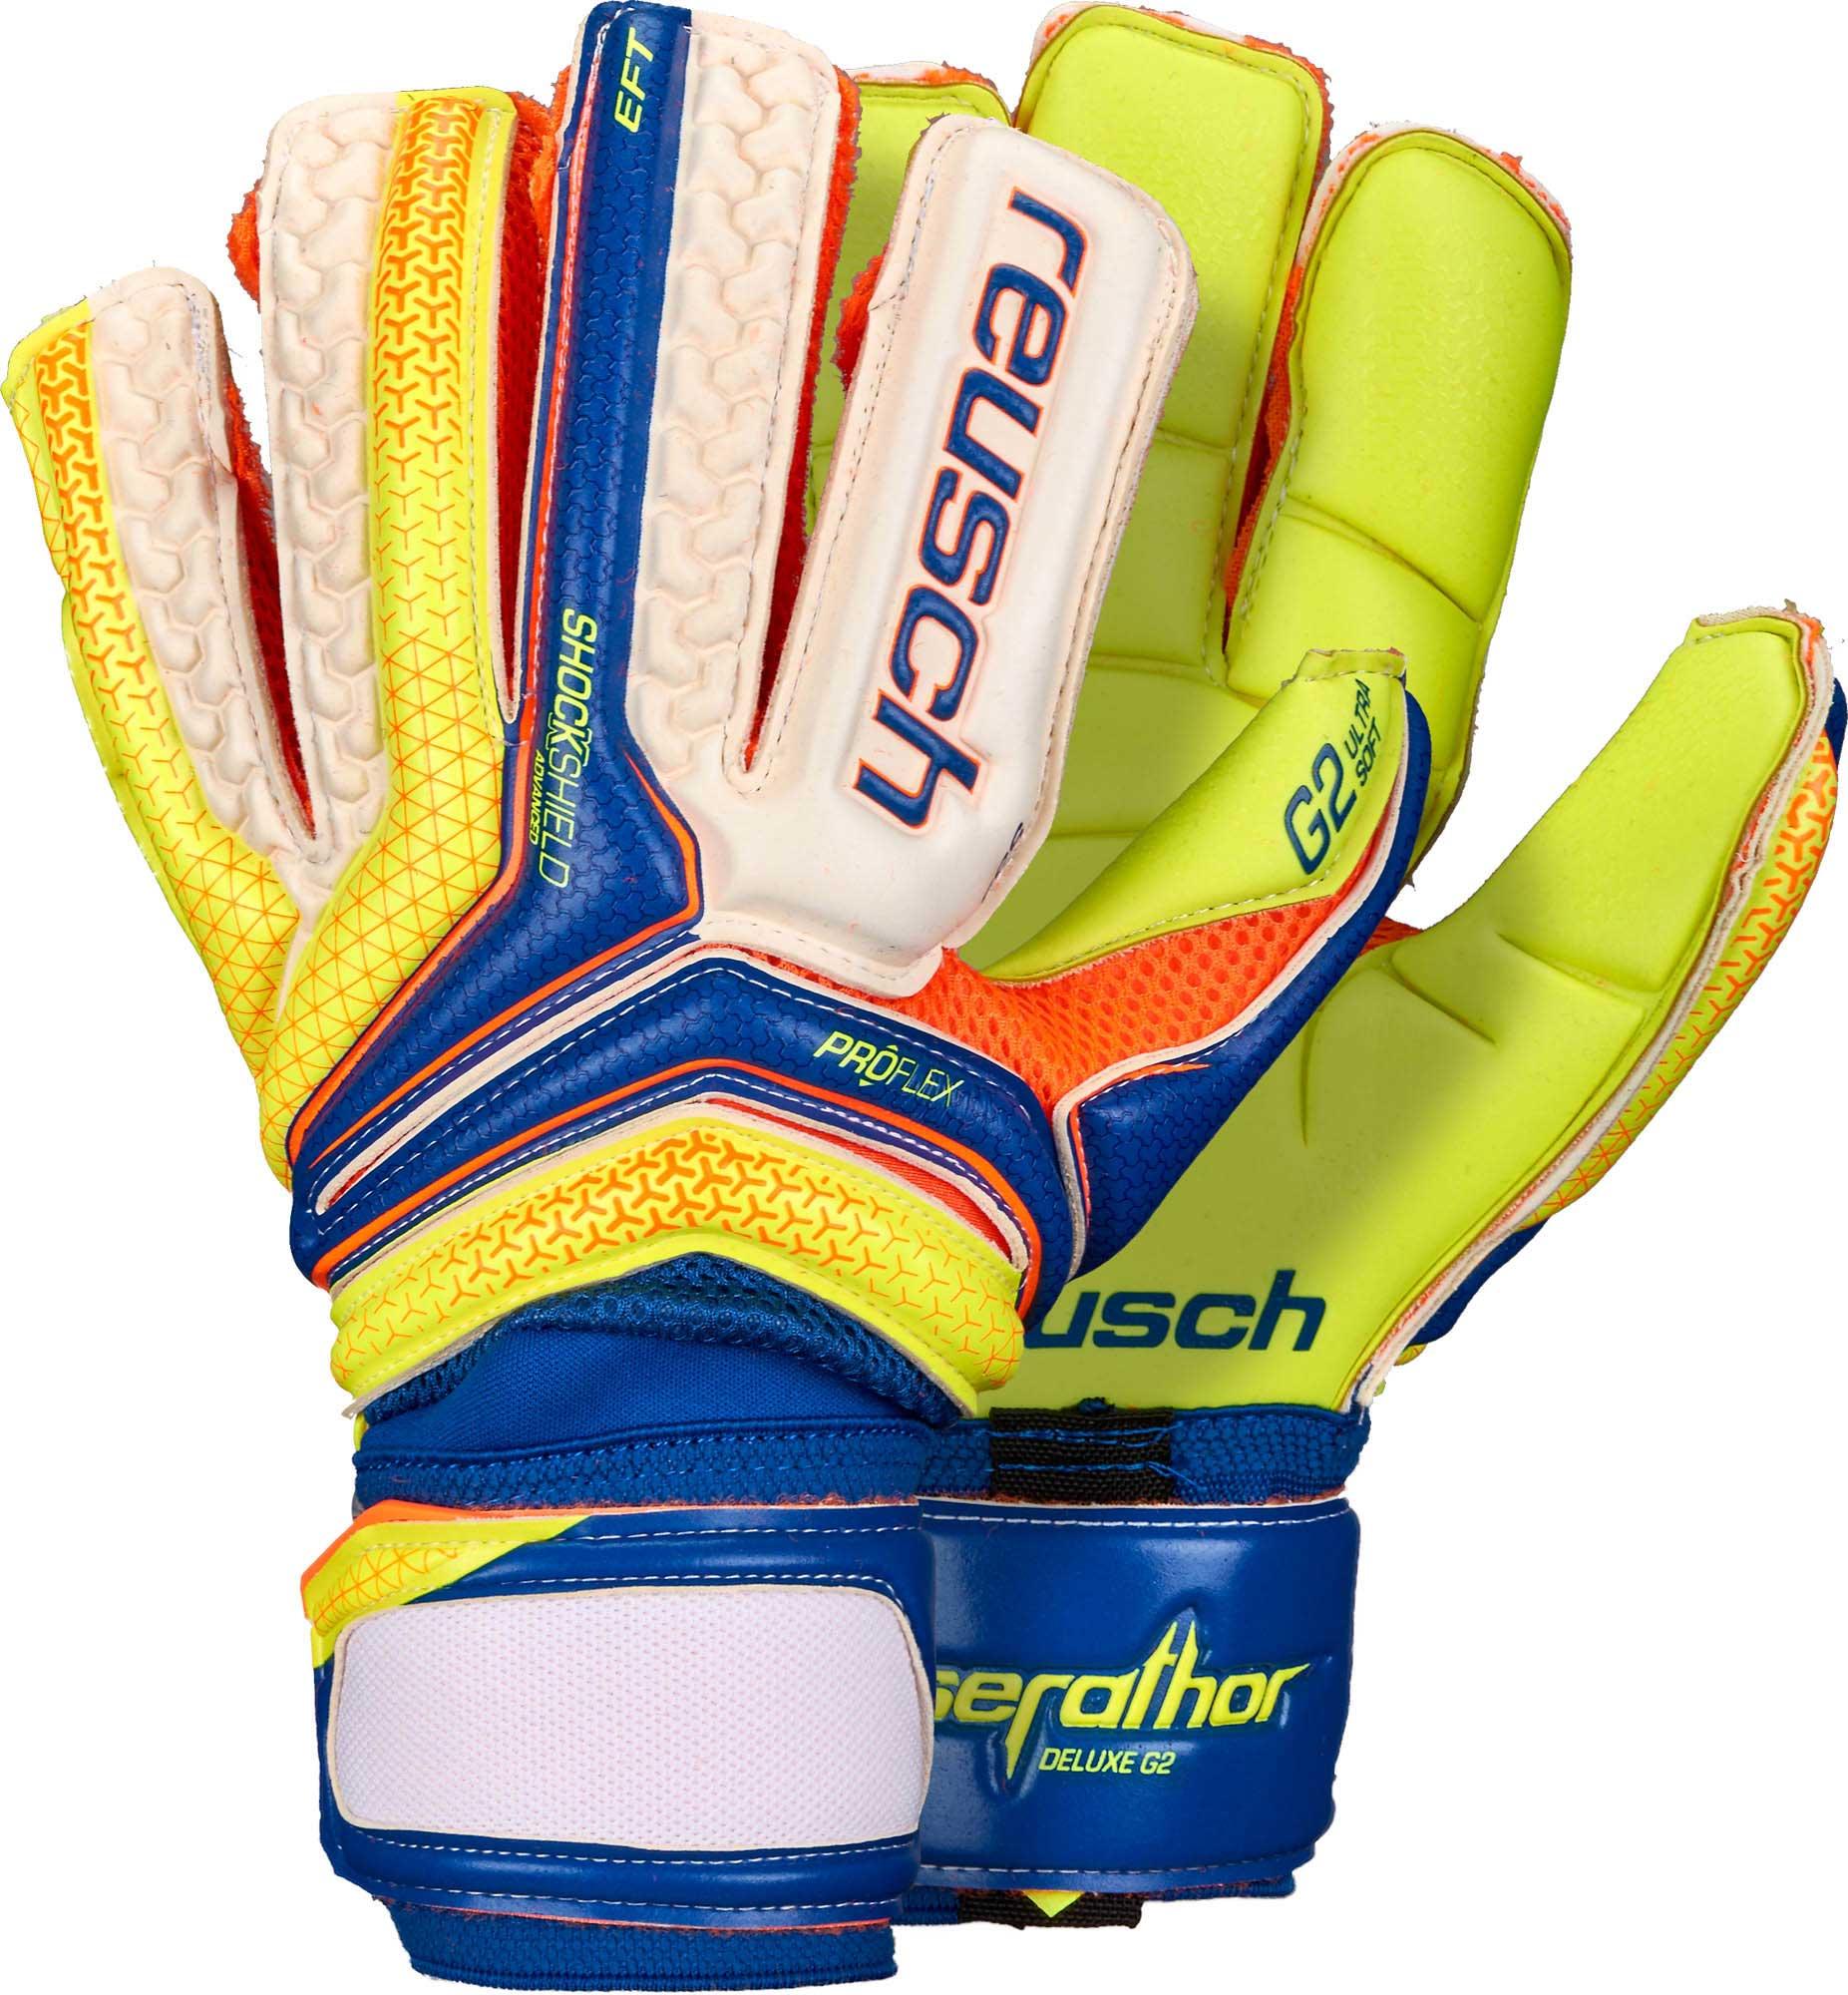 Reusch Serathor Deluxe G2 Goalkeeper Gloves – Dazzling Blue Safety Yellow 7a4fef85f